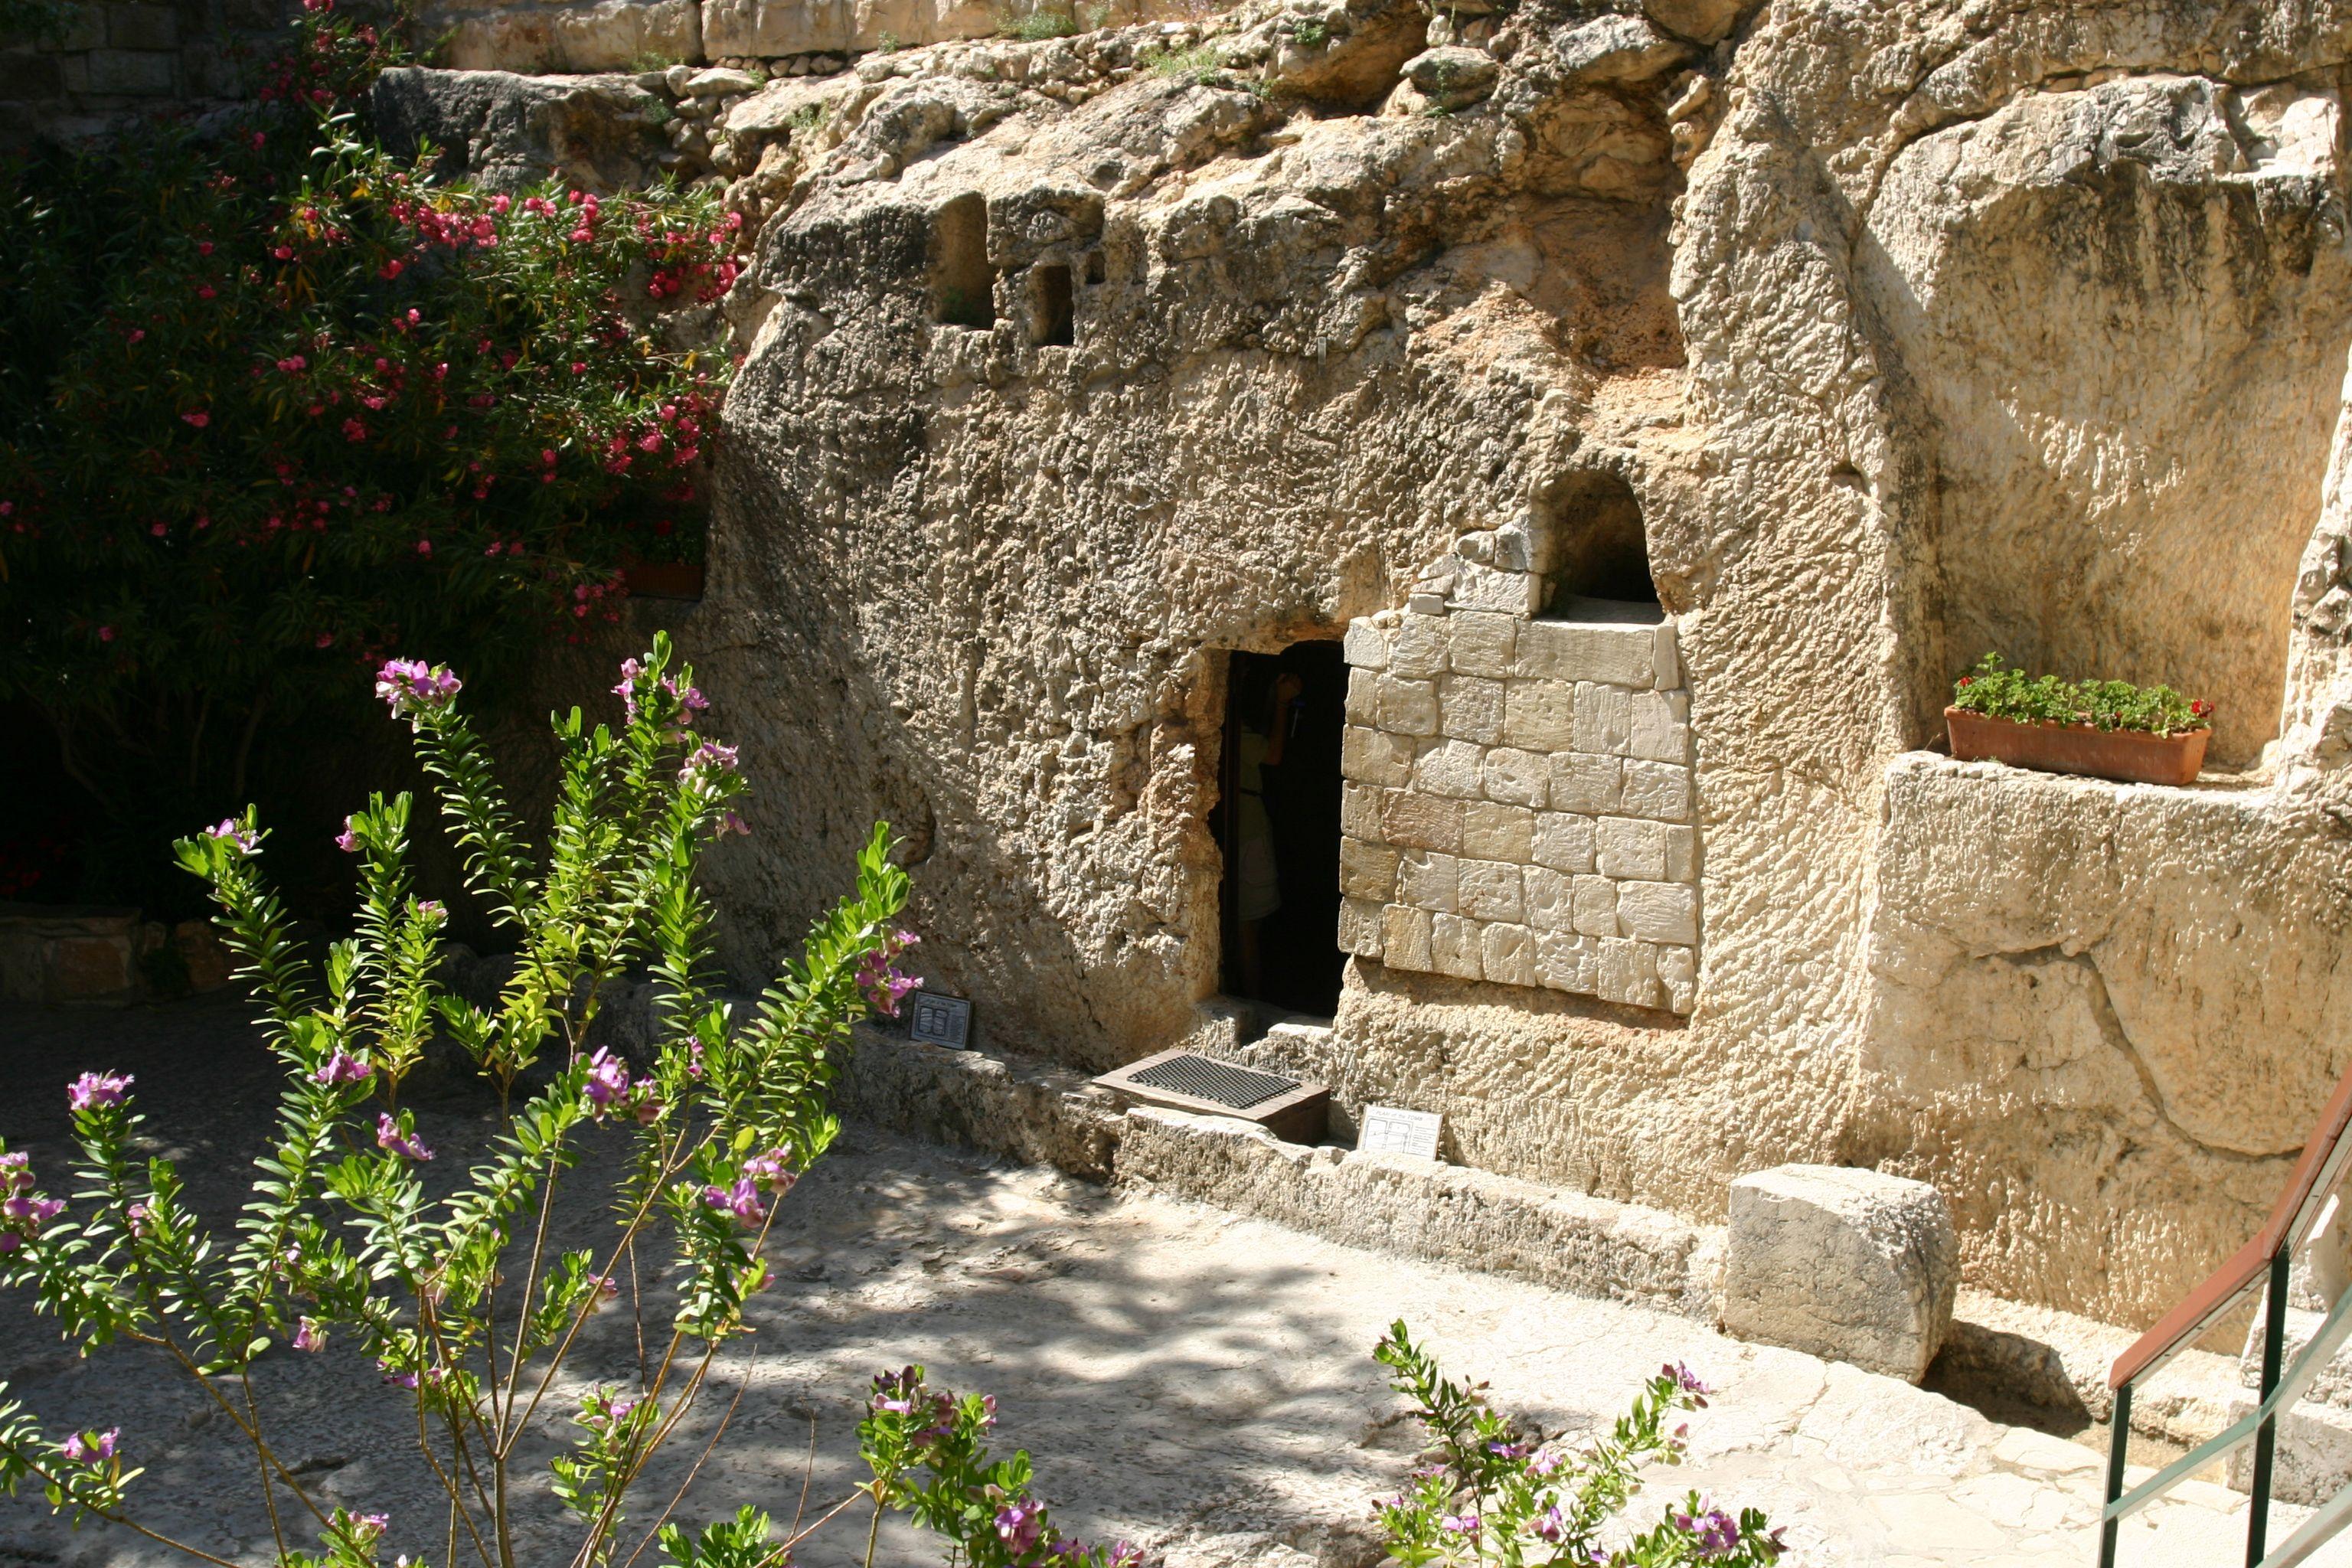 Yehoshoua Est Vivant ! Ce Shabbat fût un Grand Shabbat 17fd6b4023a1b8b670db961723e5ab6e